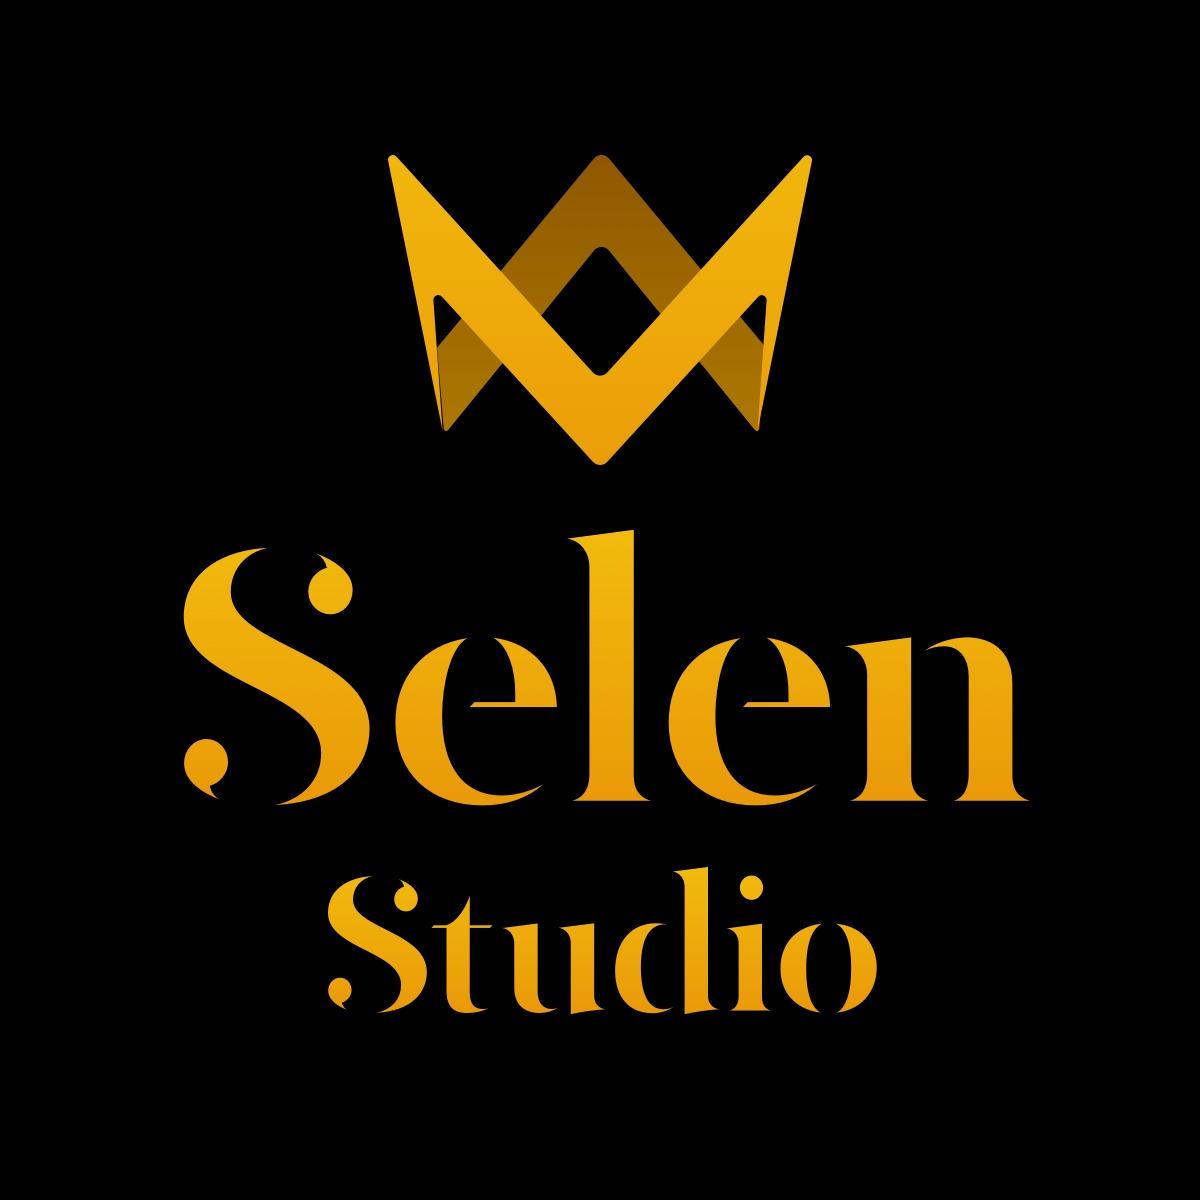 2Advanced Studios